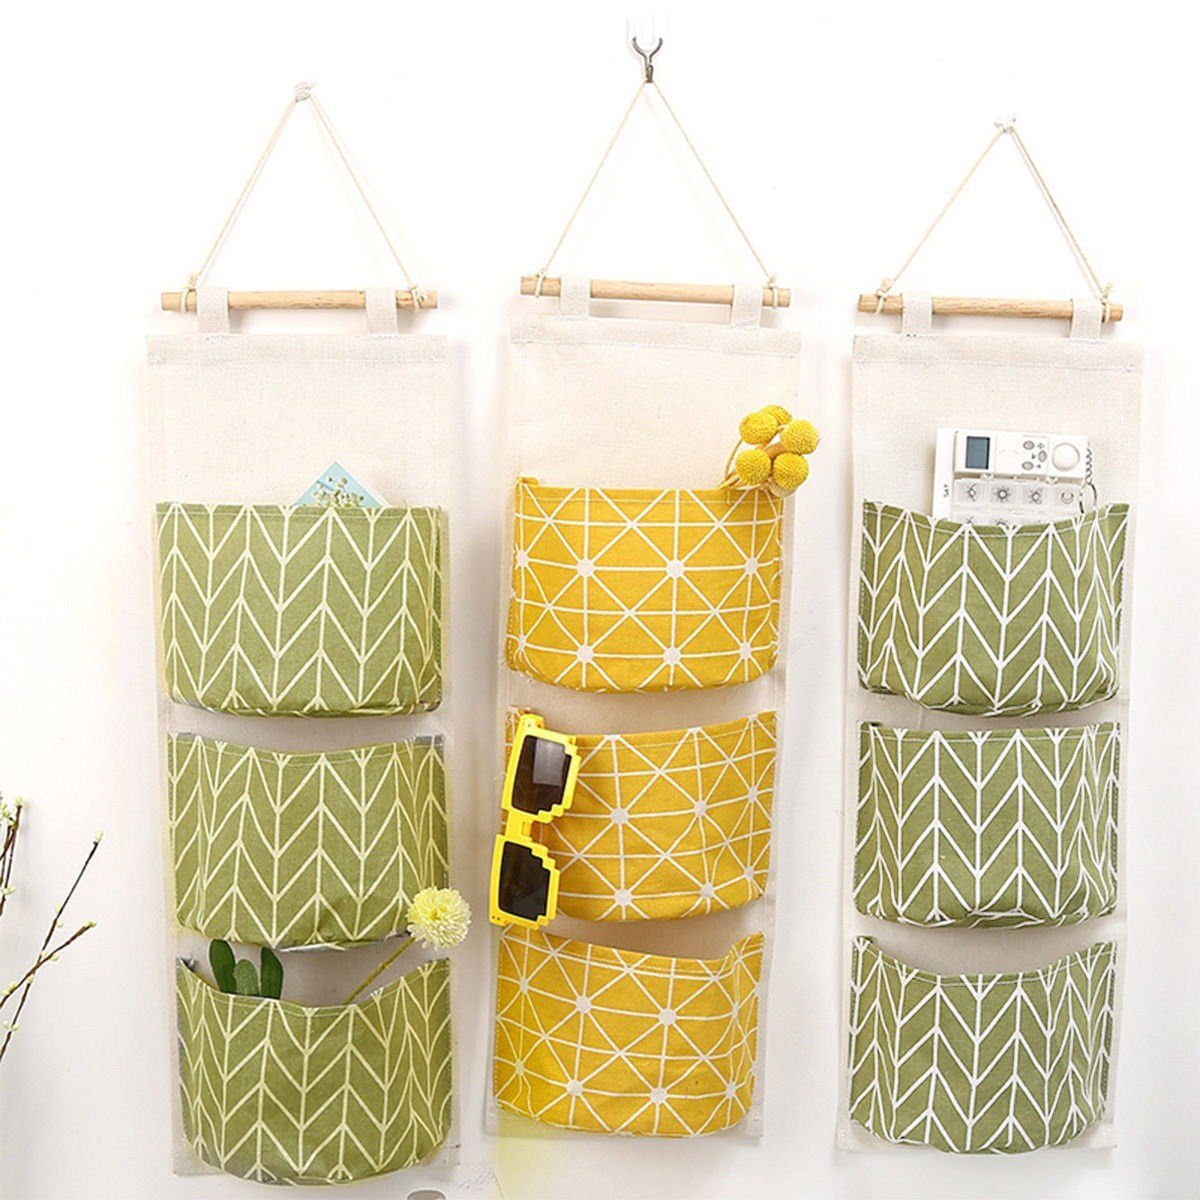 yunita_1106stores 3 Grids Wall Hanging Storage Bag Organizer Toys Container Decor Pocket by yunita_1106stores (Image #1)